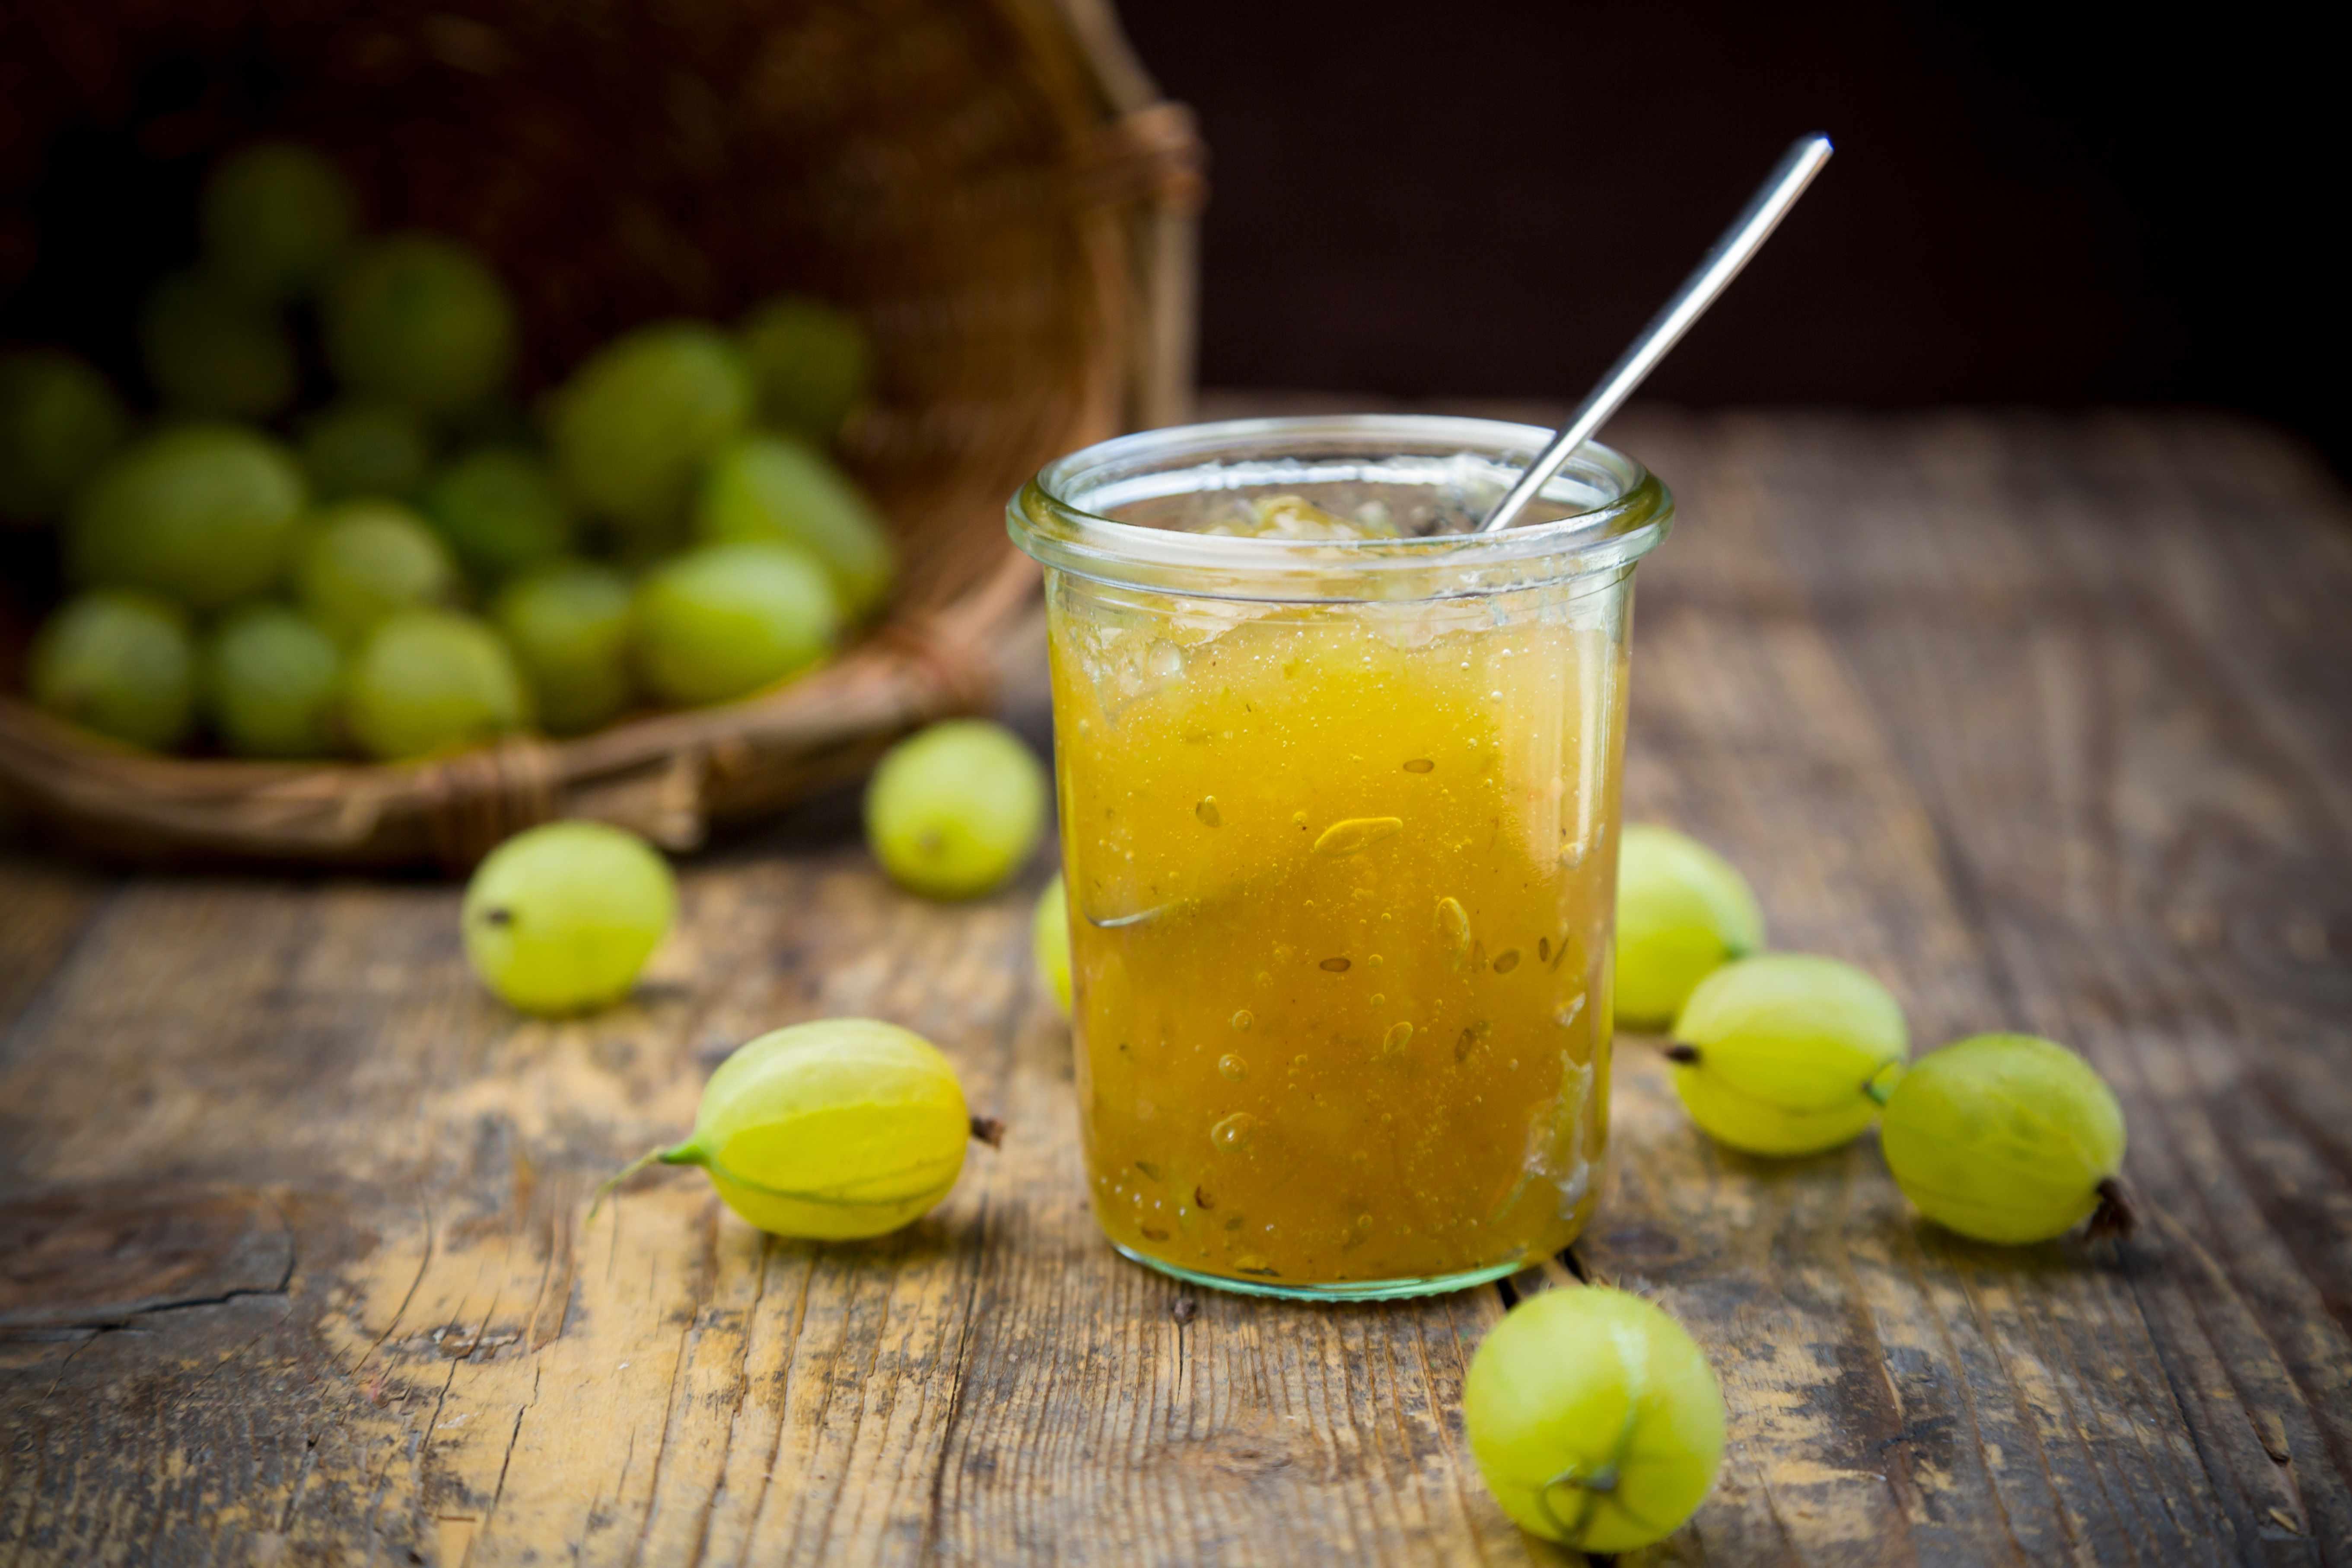 Jar of gooseberry jam, basket and organic gooseberries on dark wood